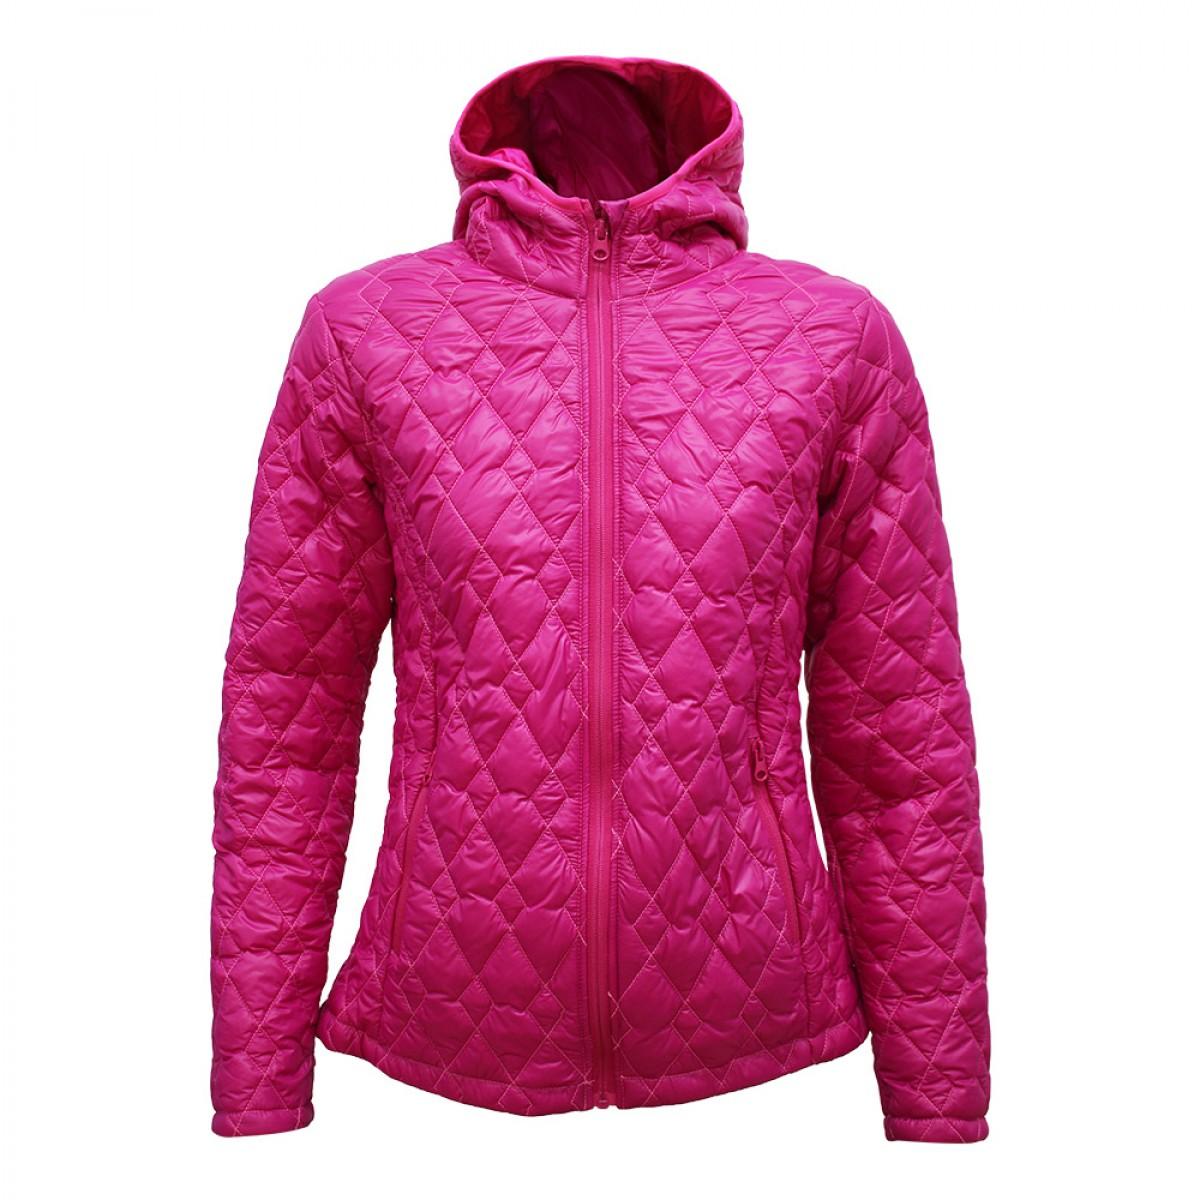 women-polyfiber-jacket-with-hoodie-kpj06913-2a